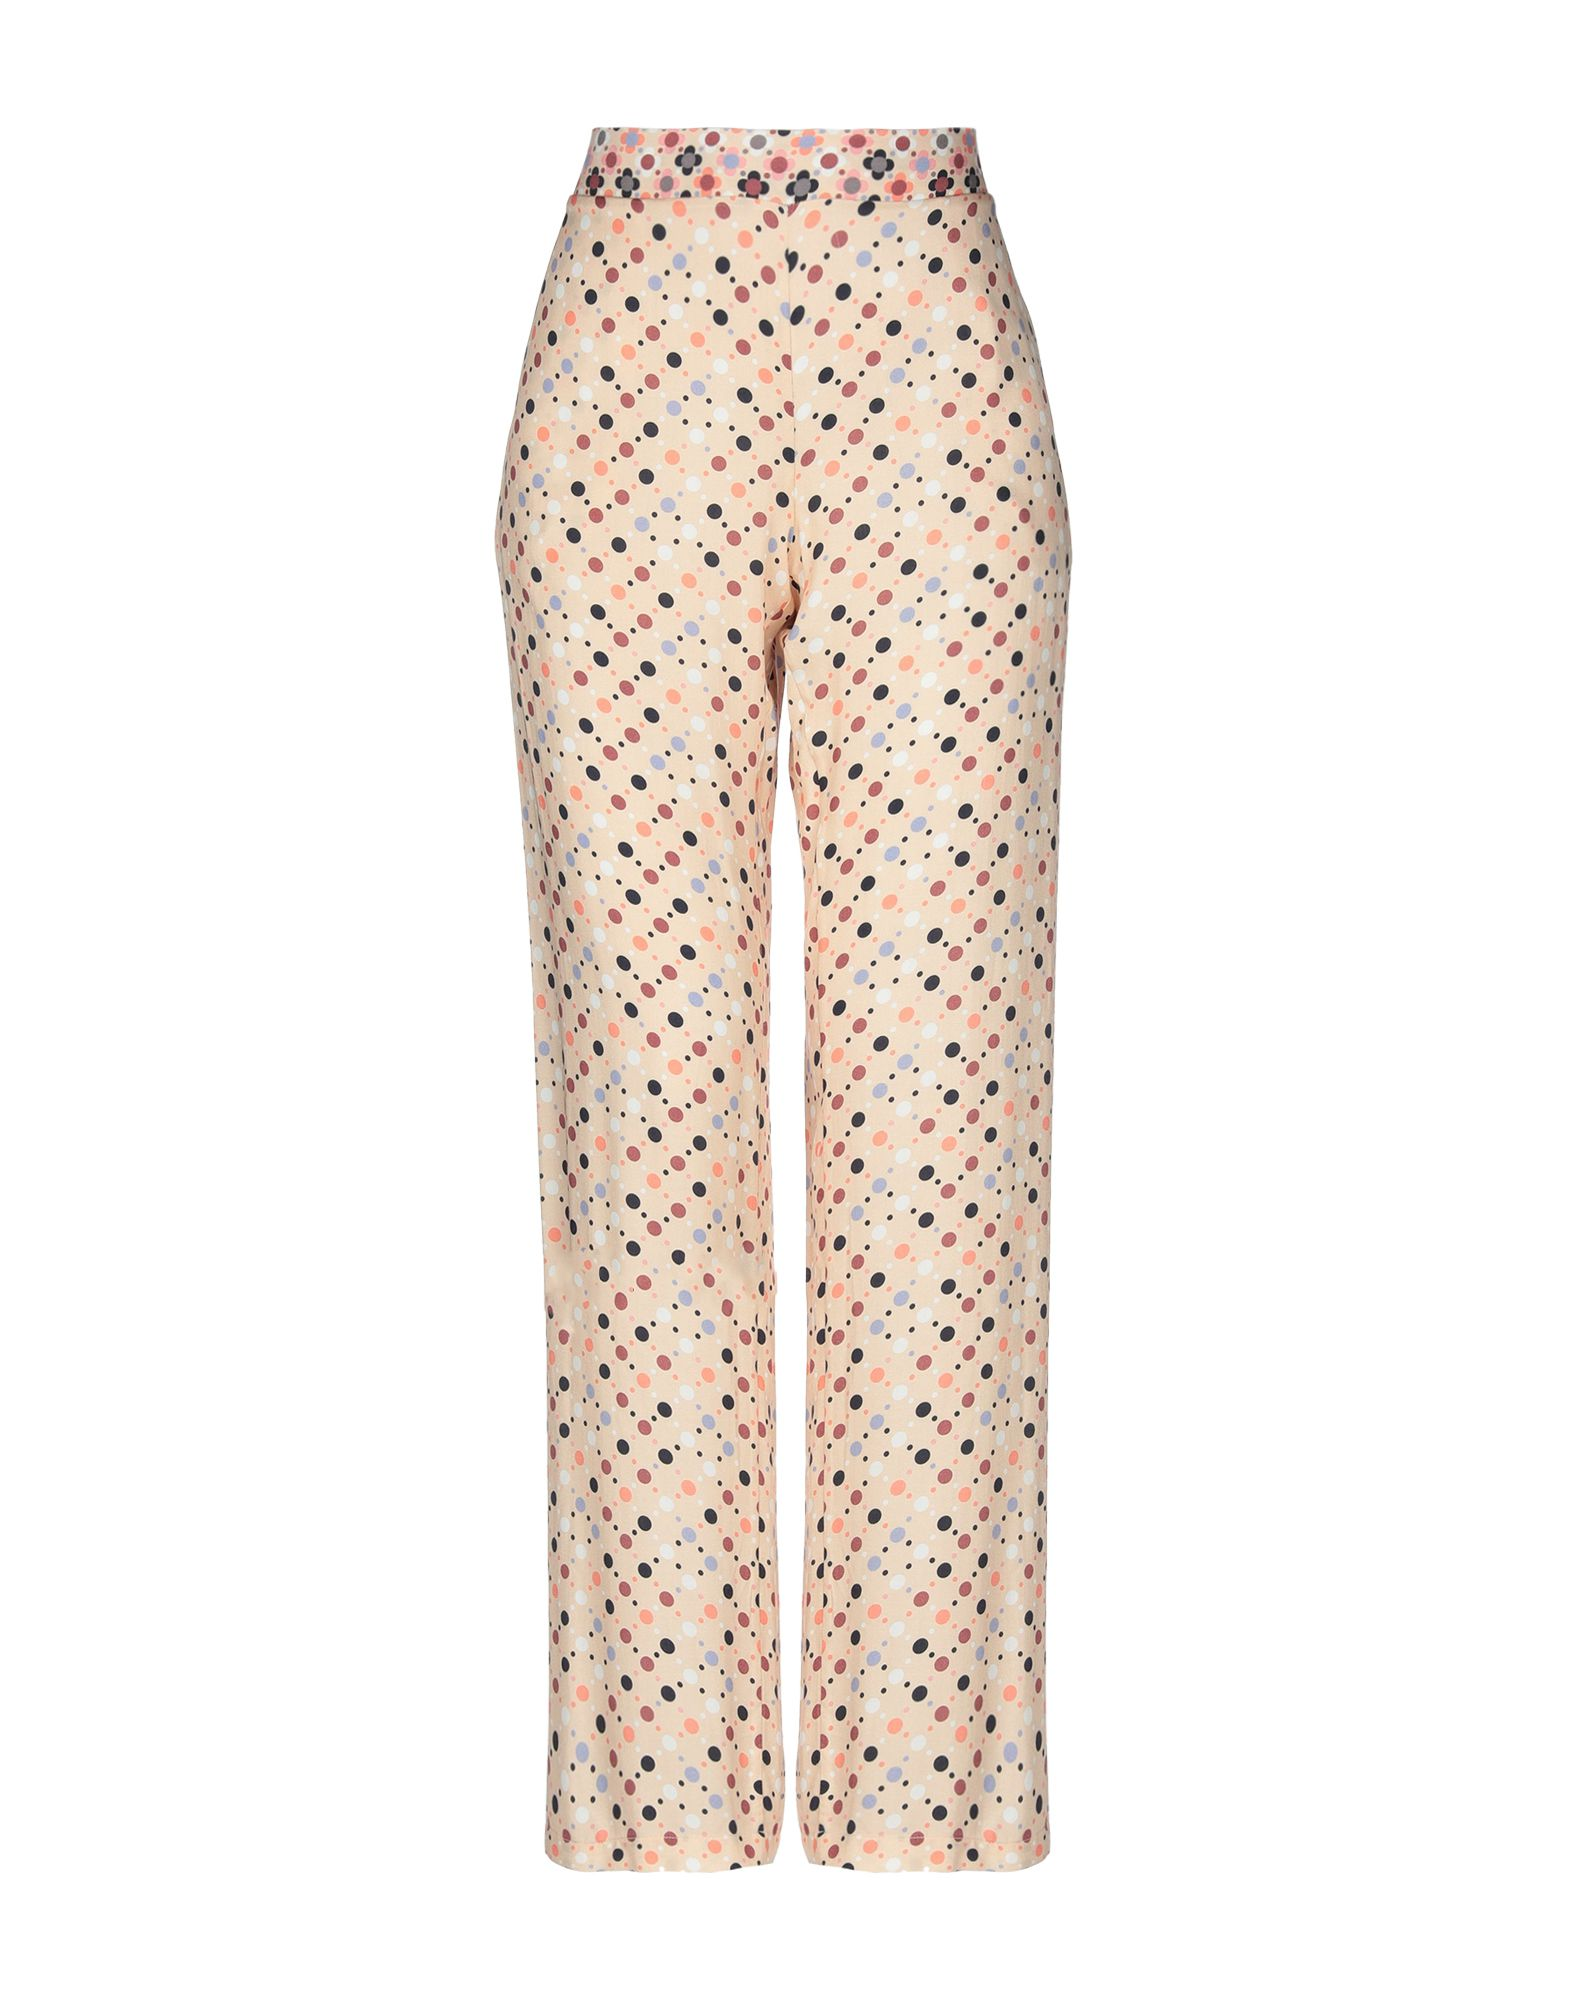 TWIN-SET LINGERIE Повседневные брюки chiffon sheer cami lingerie set